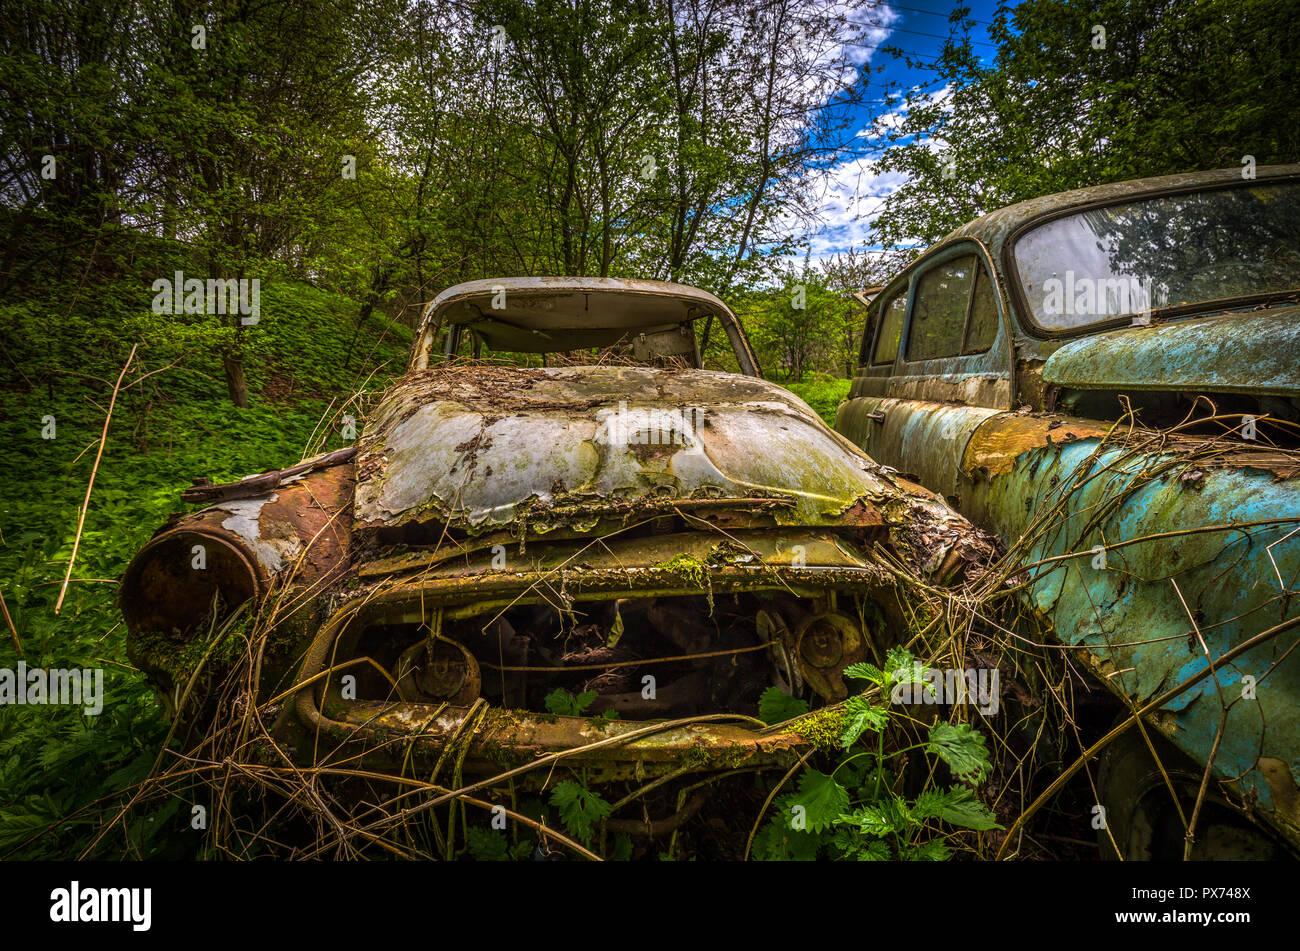 Forgotten car decaying in the garden, urbex Czech republic - Stock Image